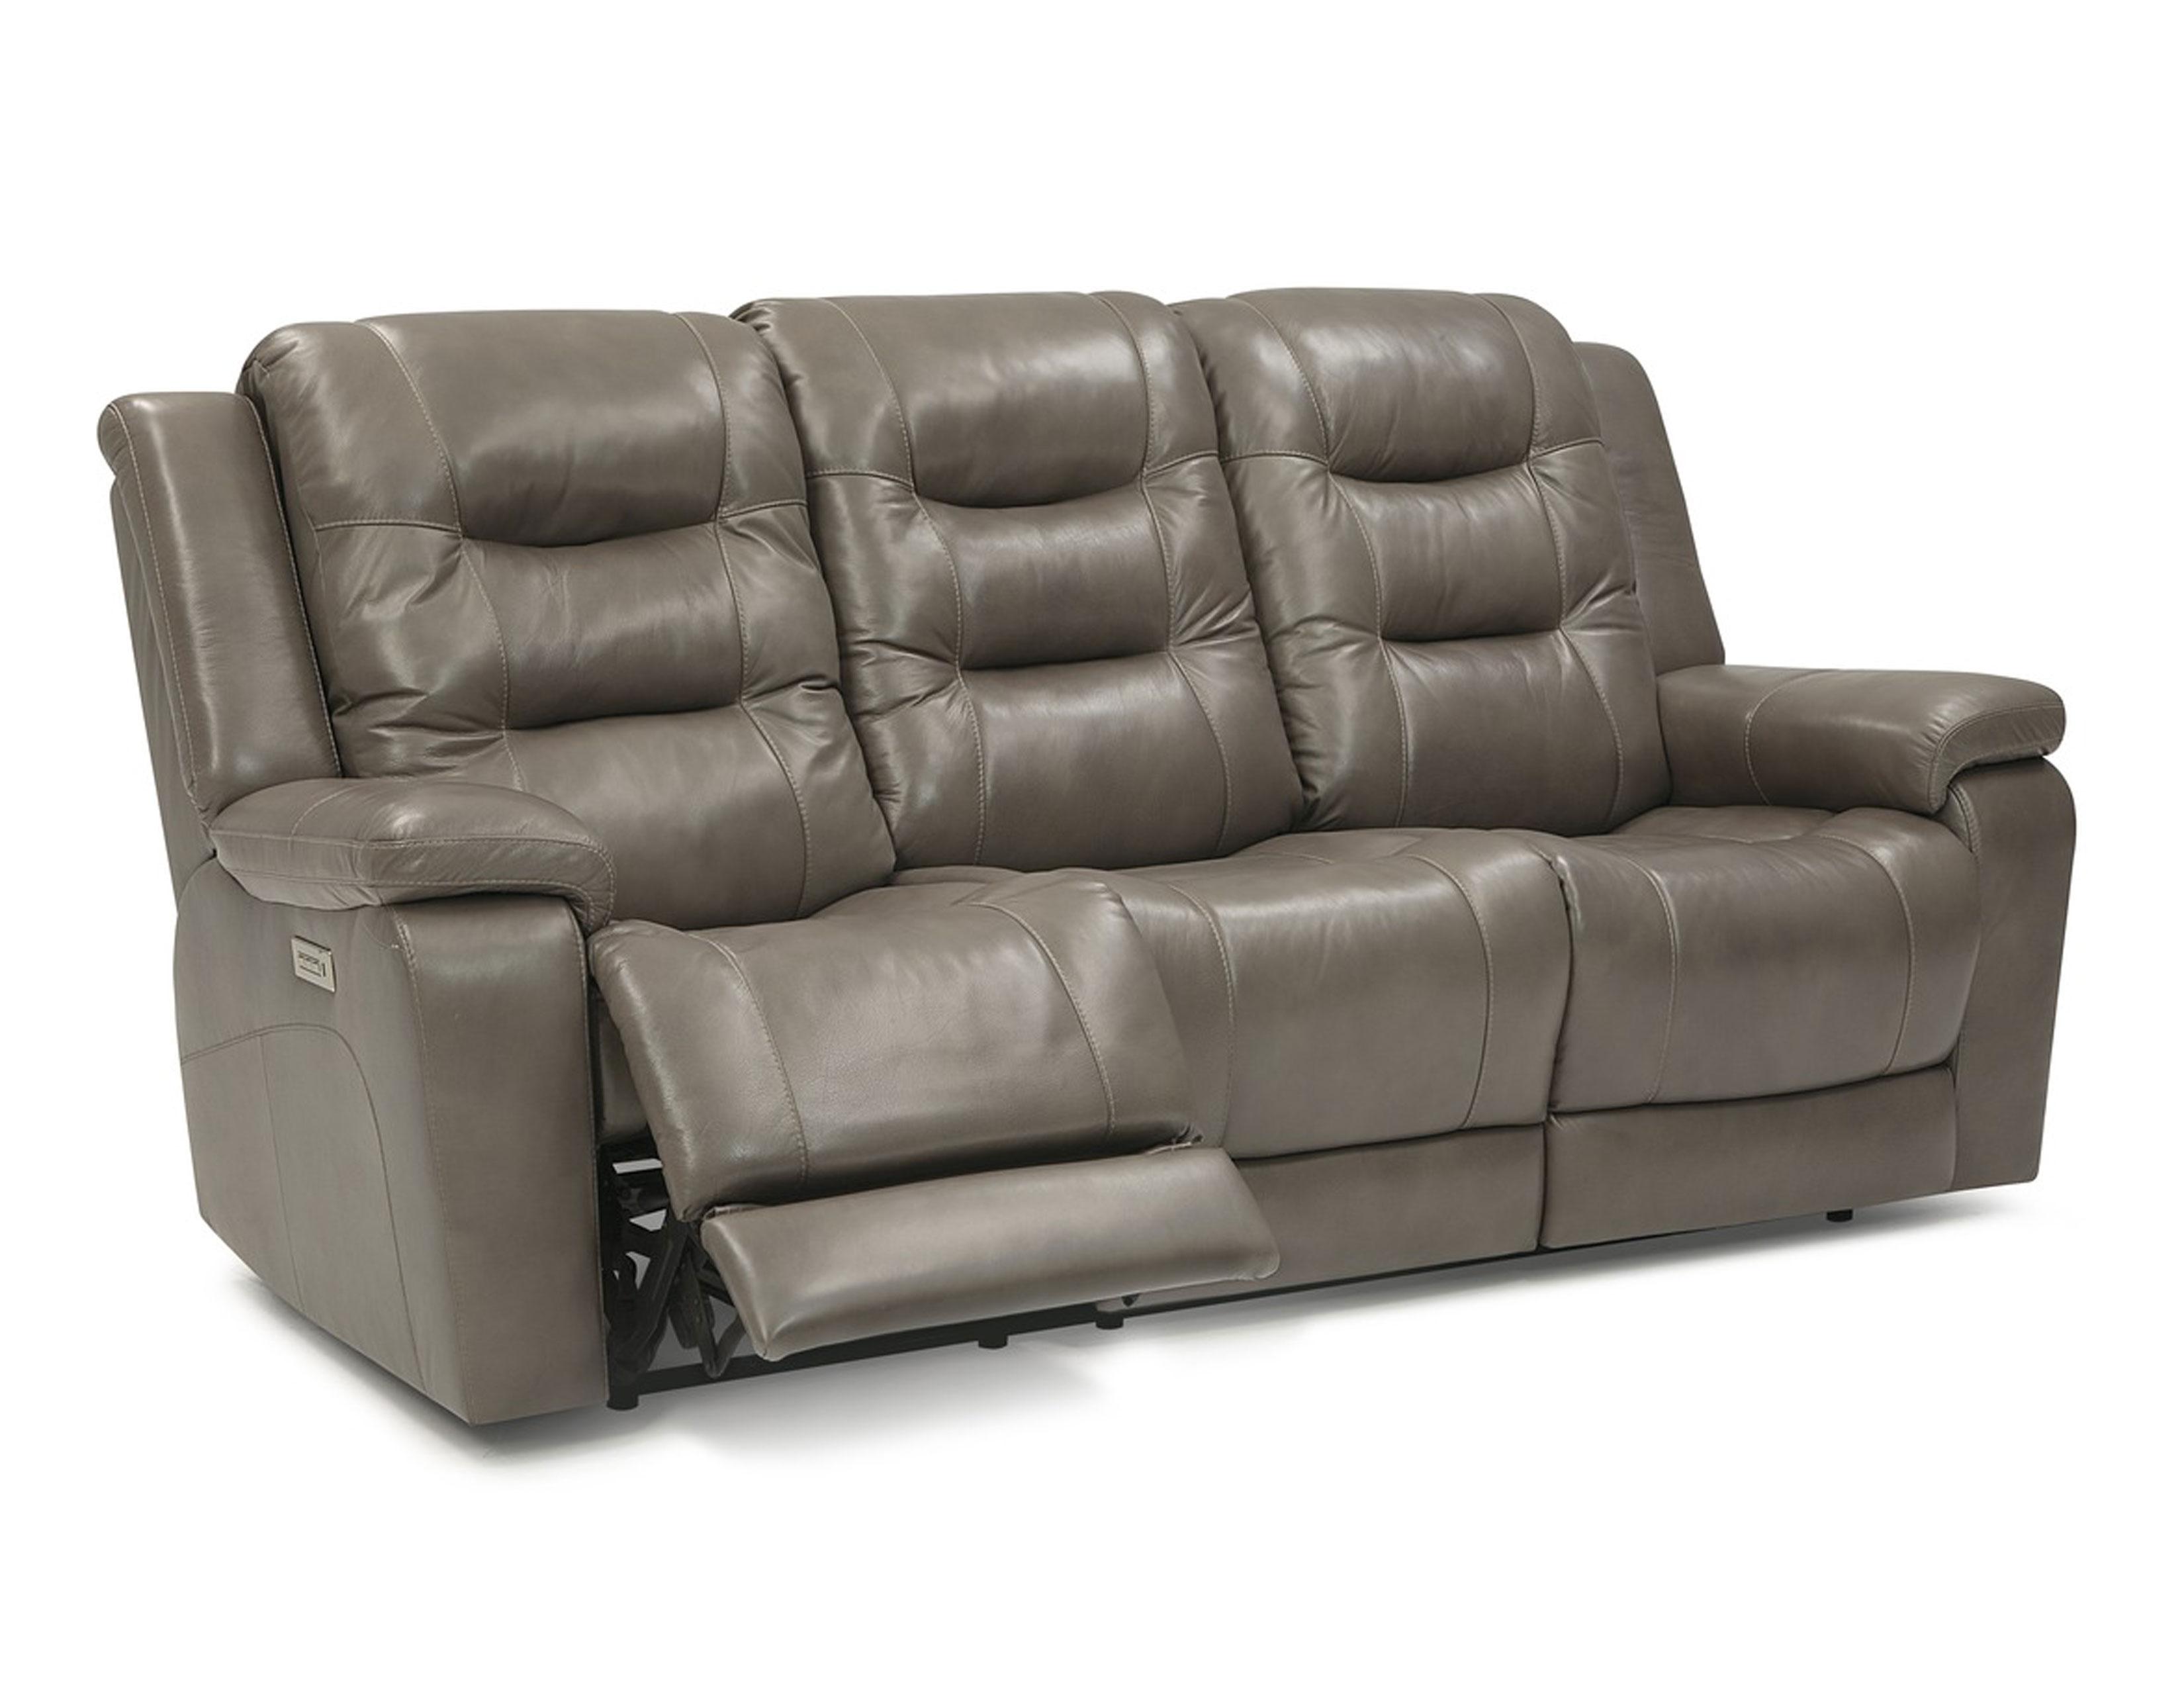 Admirable Leighton Power Reclining Sofa W Power Headrest Sofas And Lamtechconsult Wood Chair Design Ideas Lamtechconsultcom